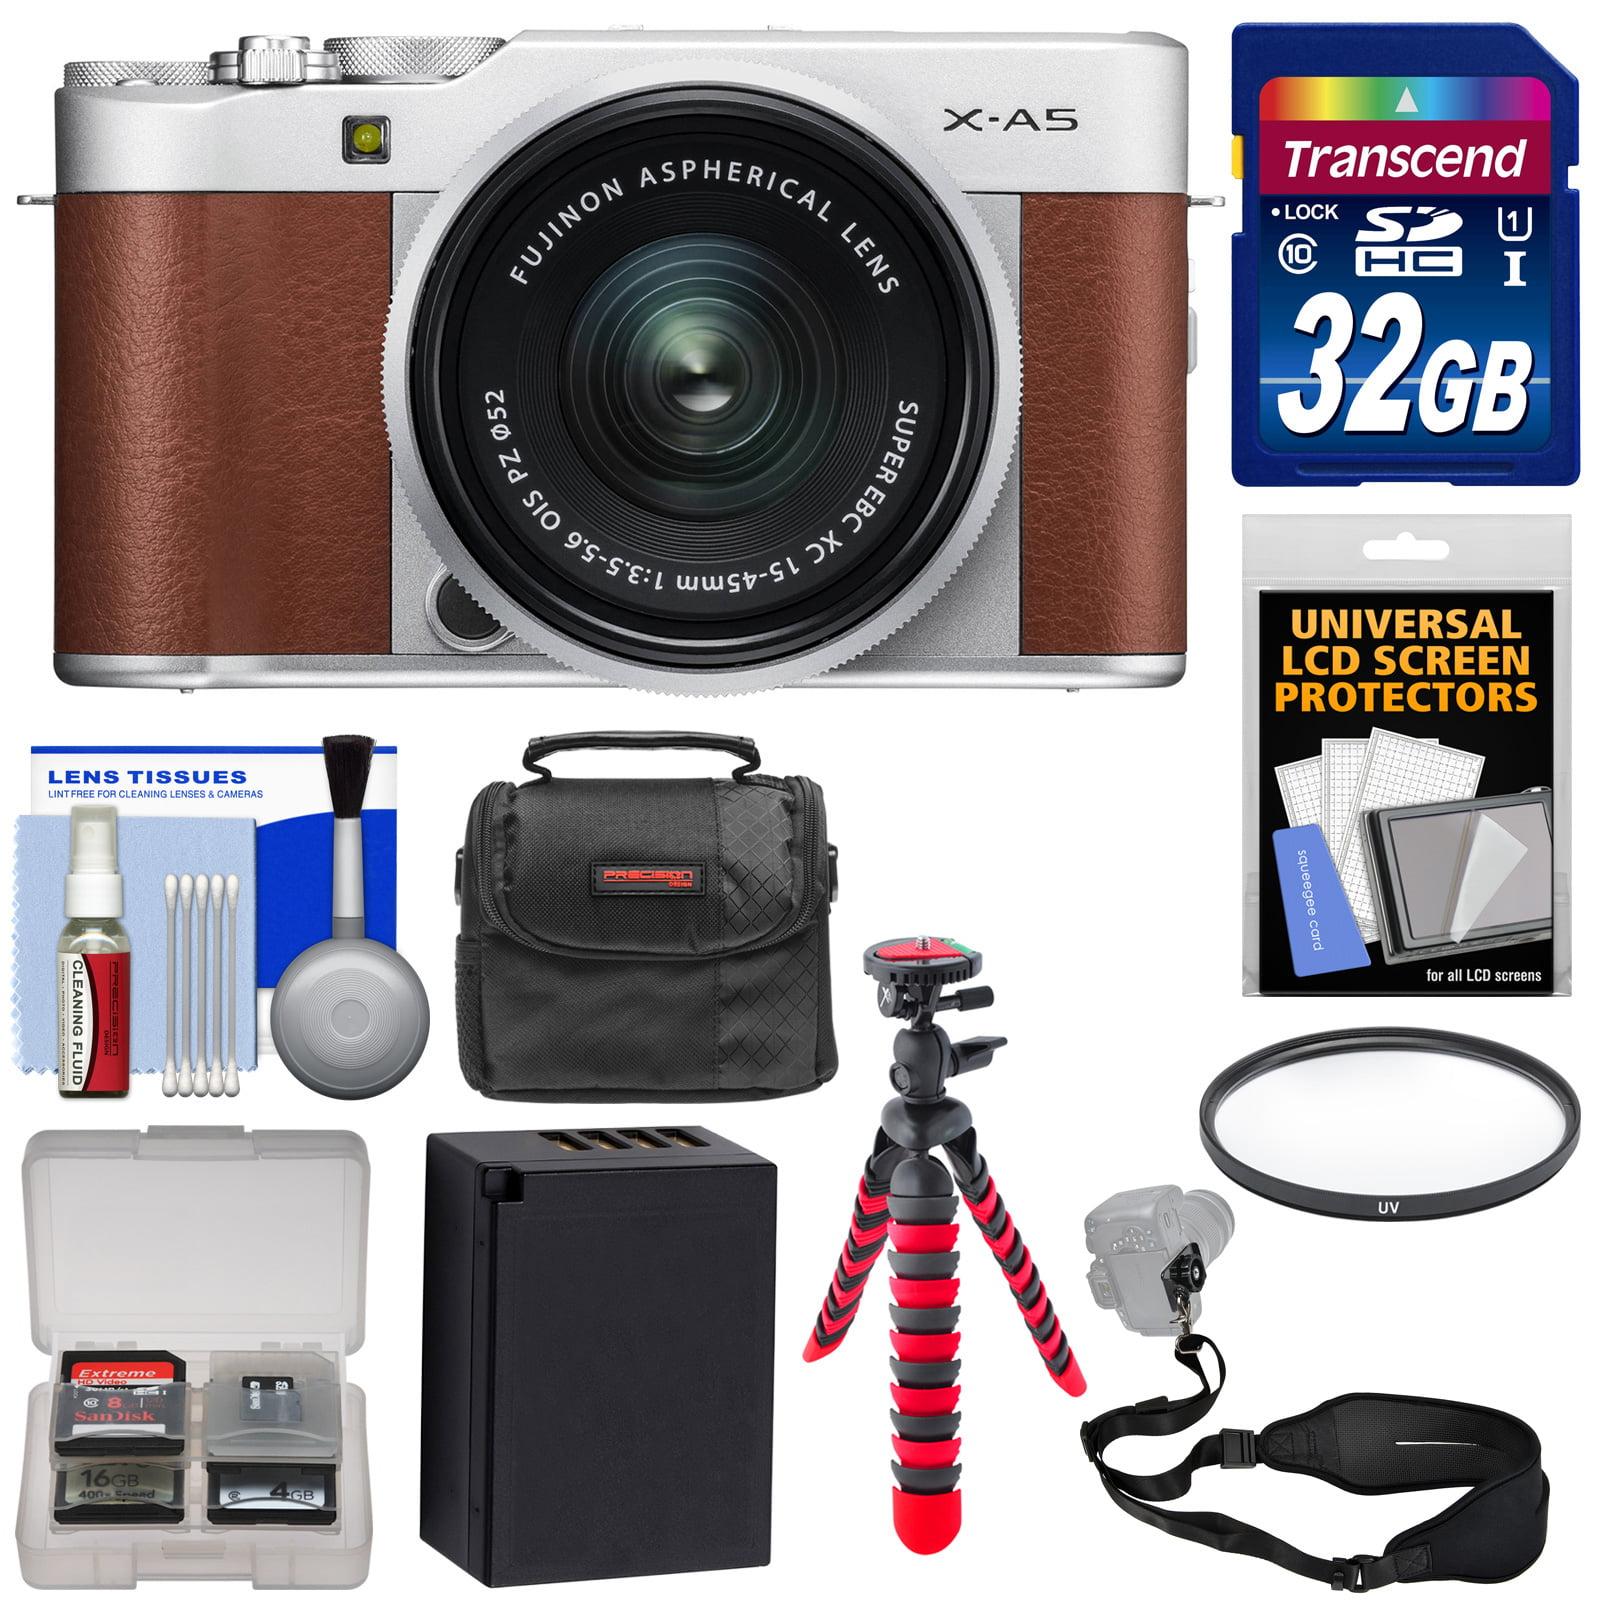 Fujifilm X-A5 Wi-Fi Digital Camera & 15-45mm XC Lens (Brown) with 32GB Card + Battery + Case + Flex Tripod + Strap + Filter + Kit